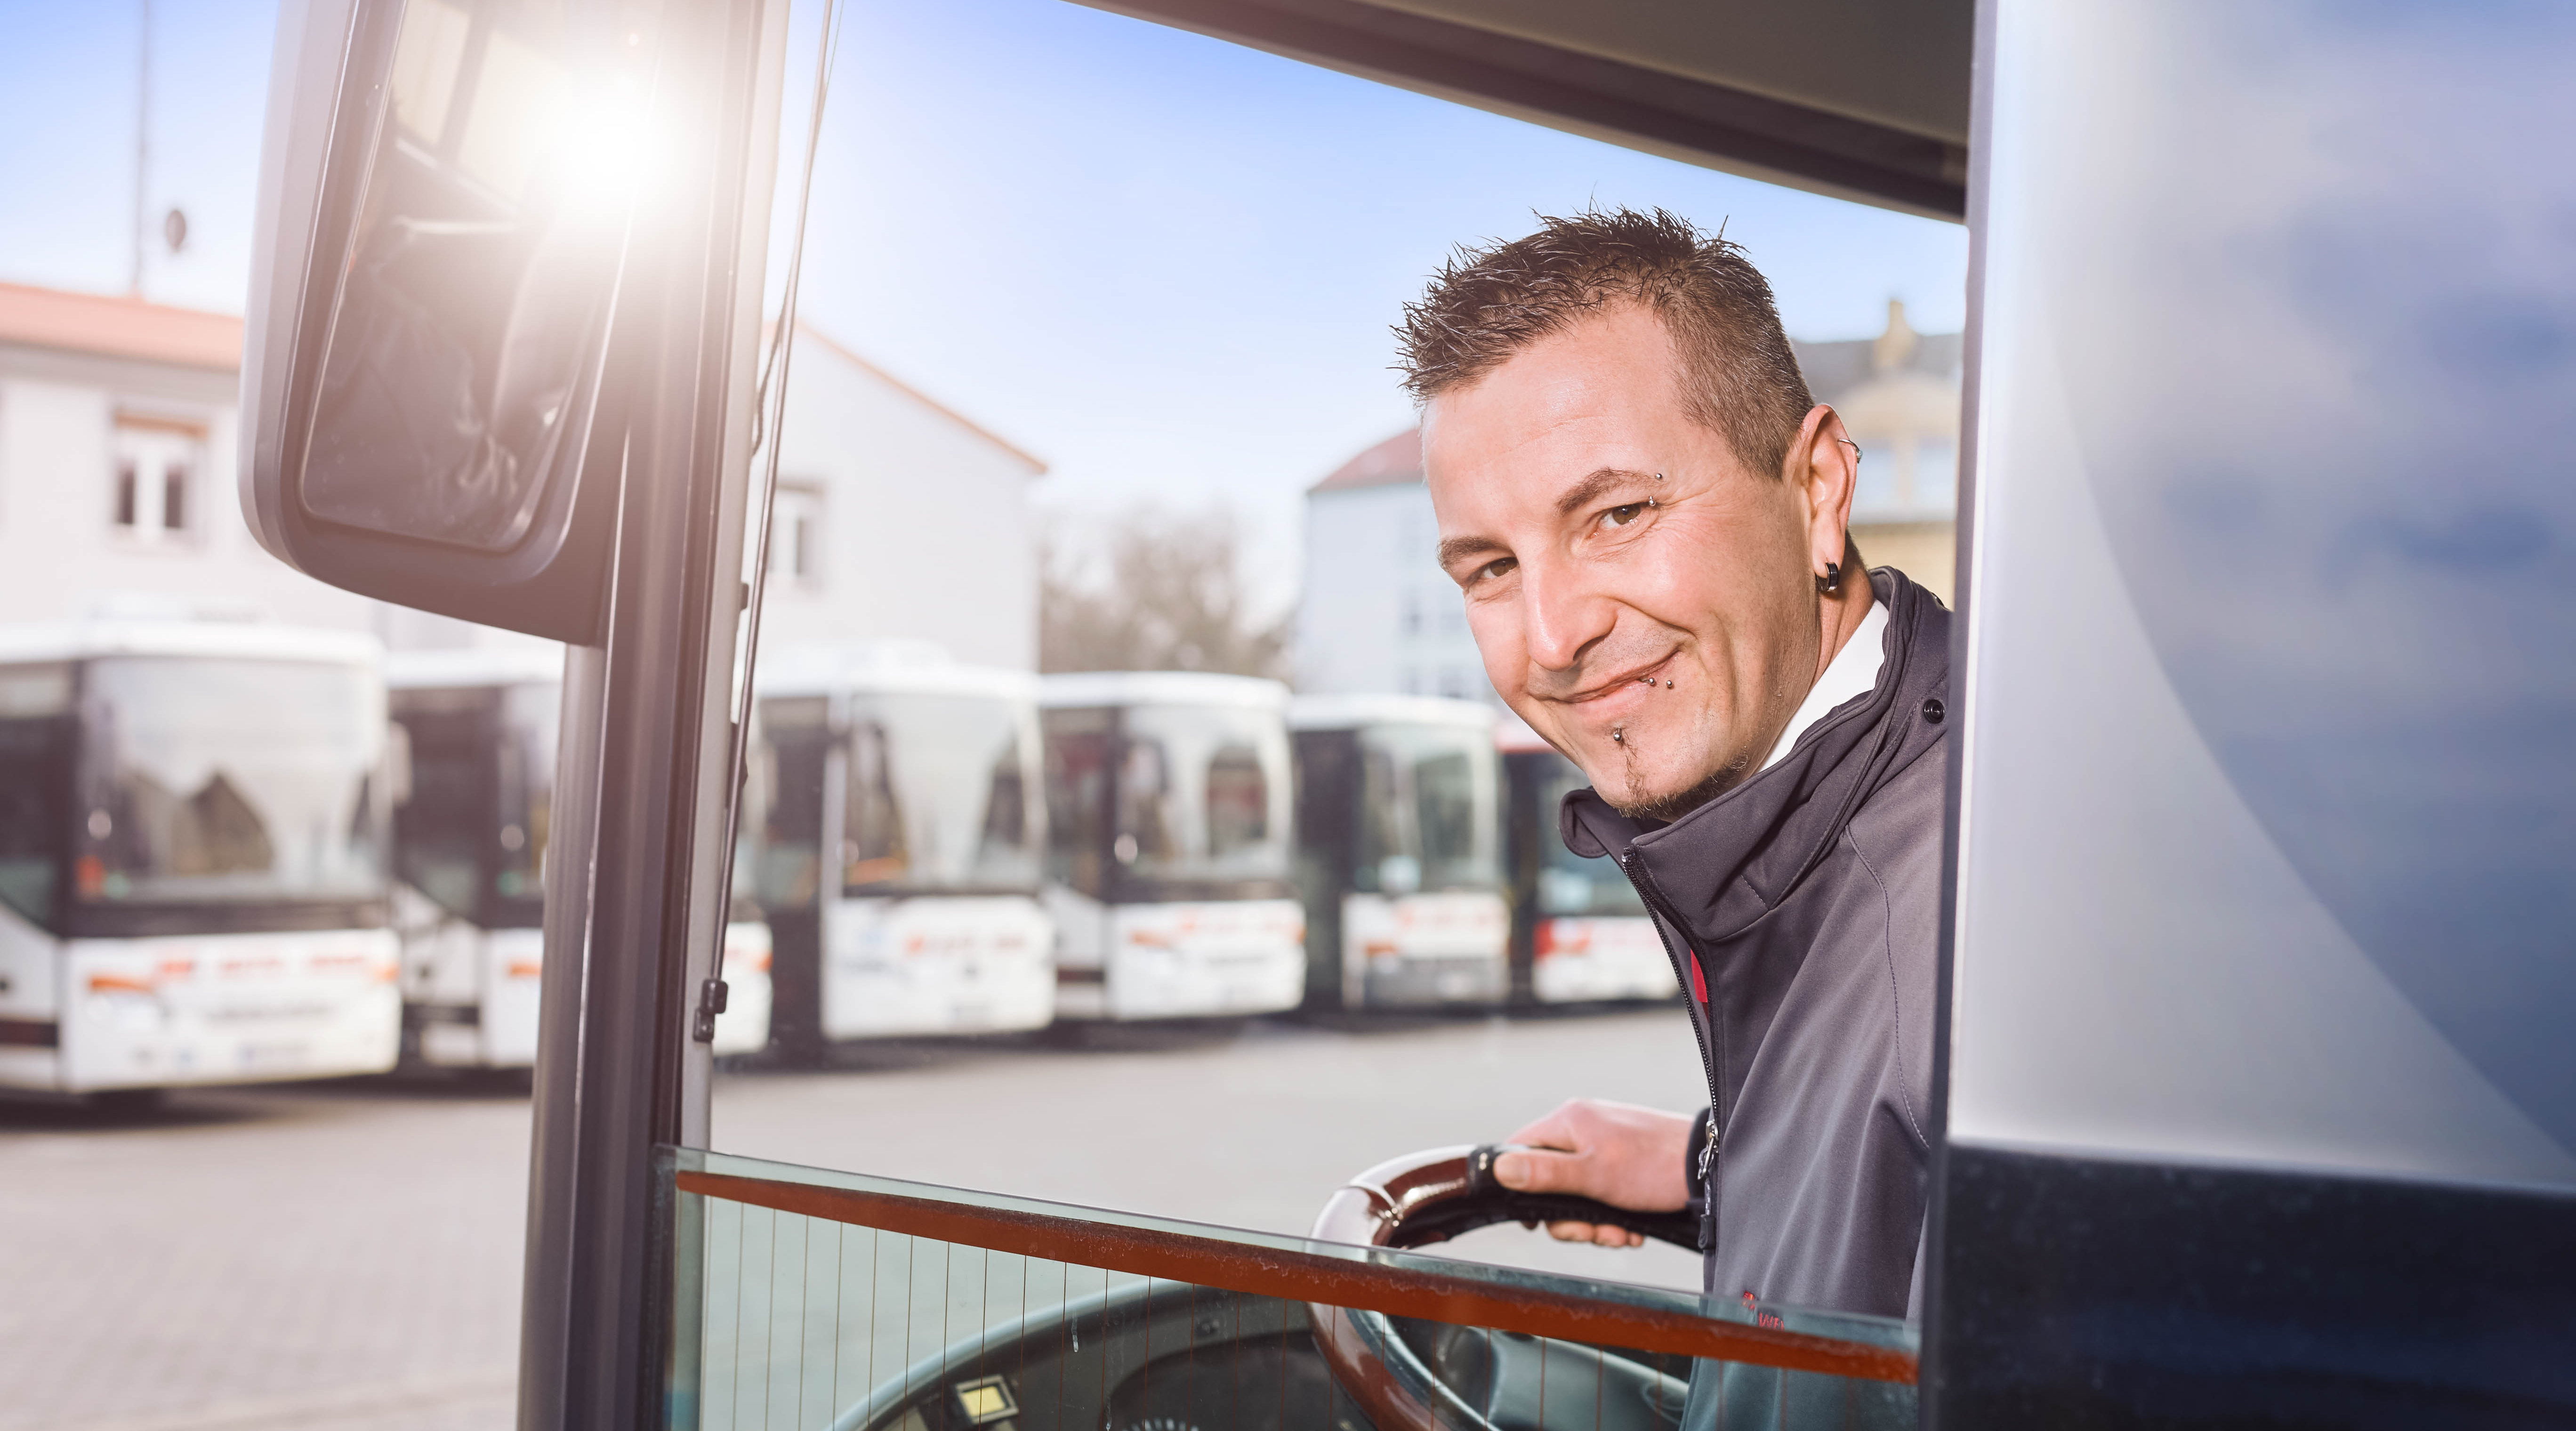 Auto Kühlschrank Mieten : Bus mieten in delitzsch auto webel gmbh